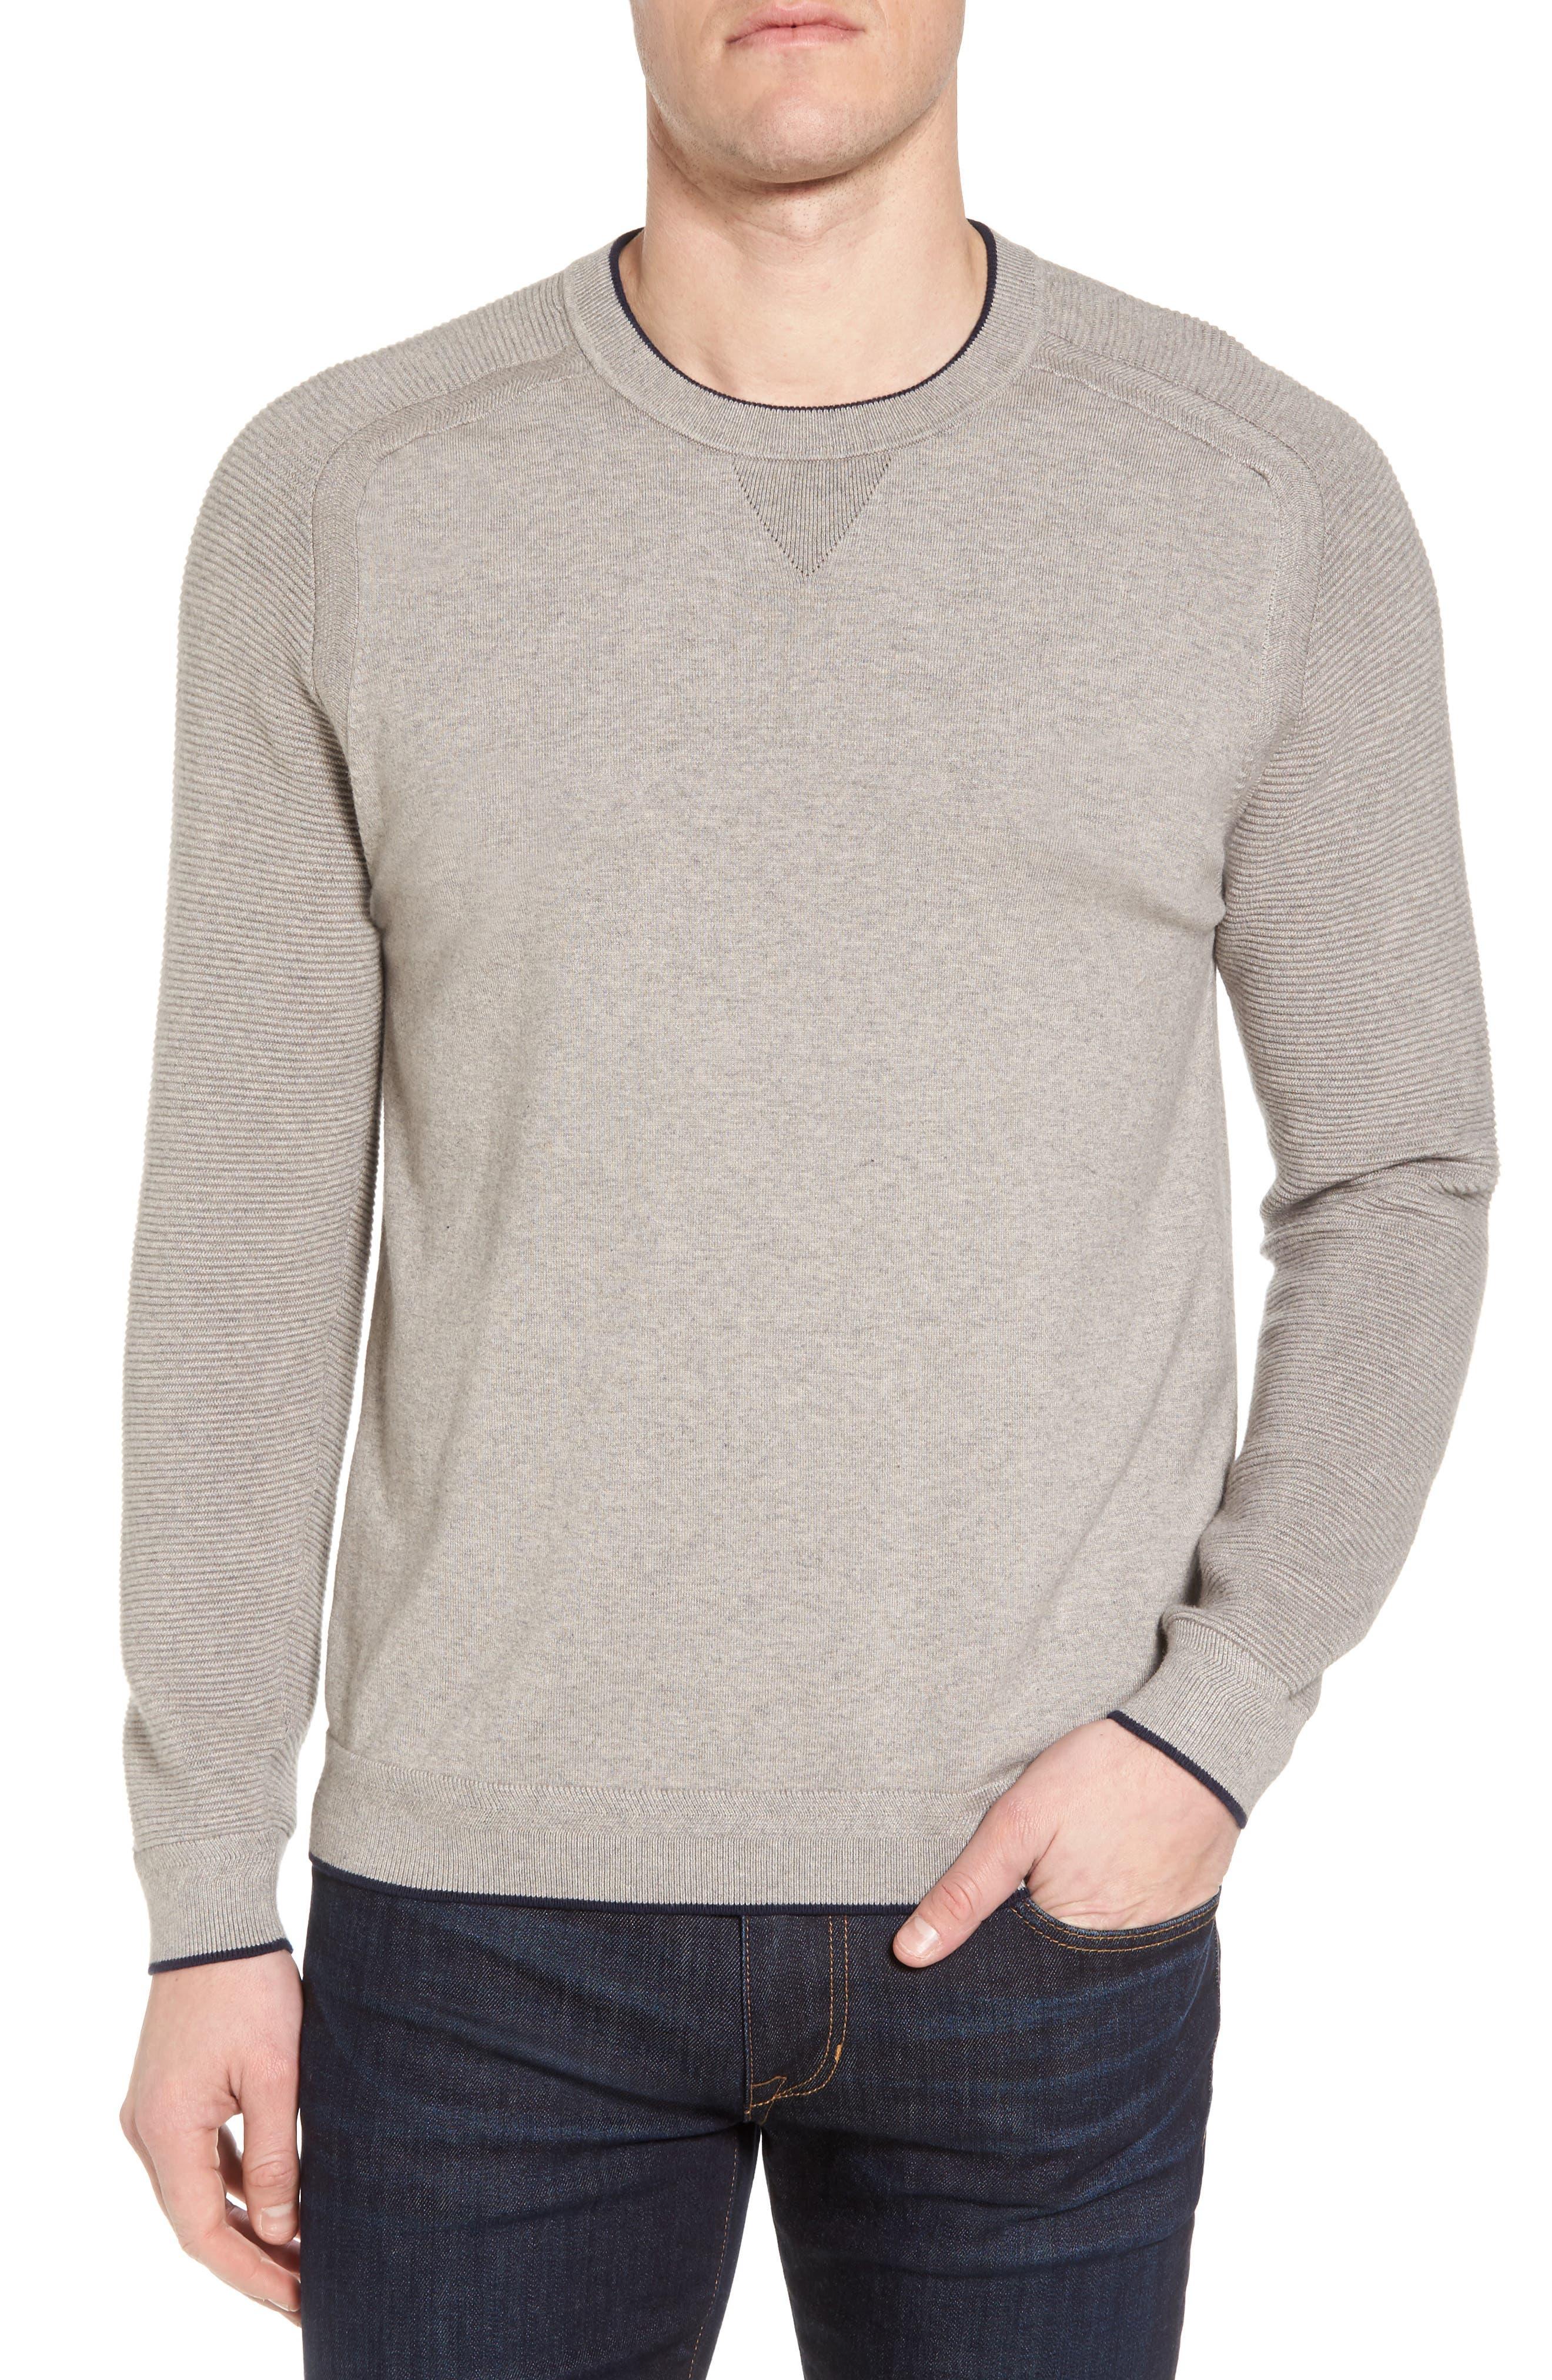 Kayfed Rib Sleeve Sweater,                         Main,                         color, Grey Marl